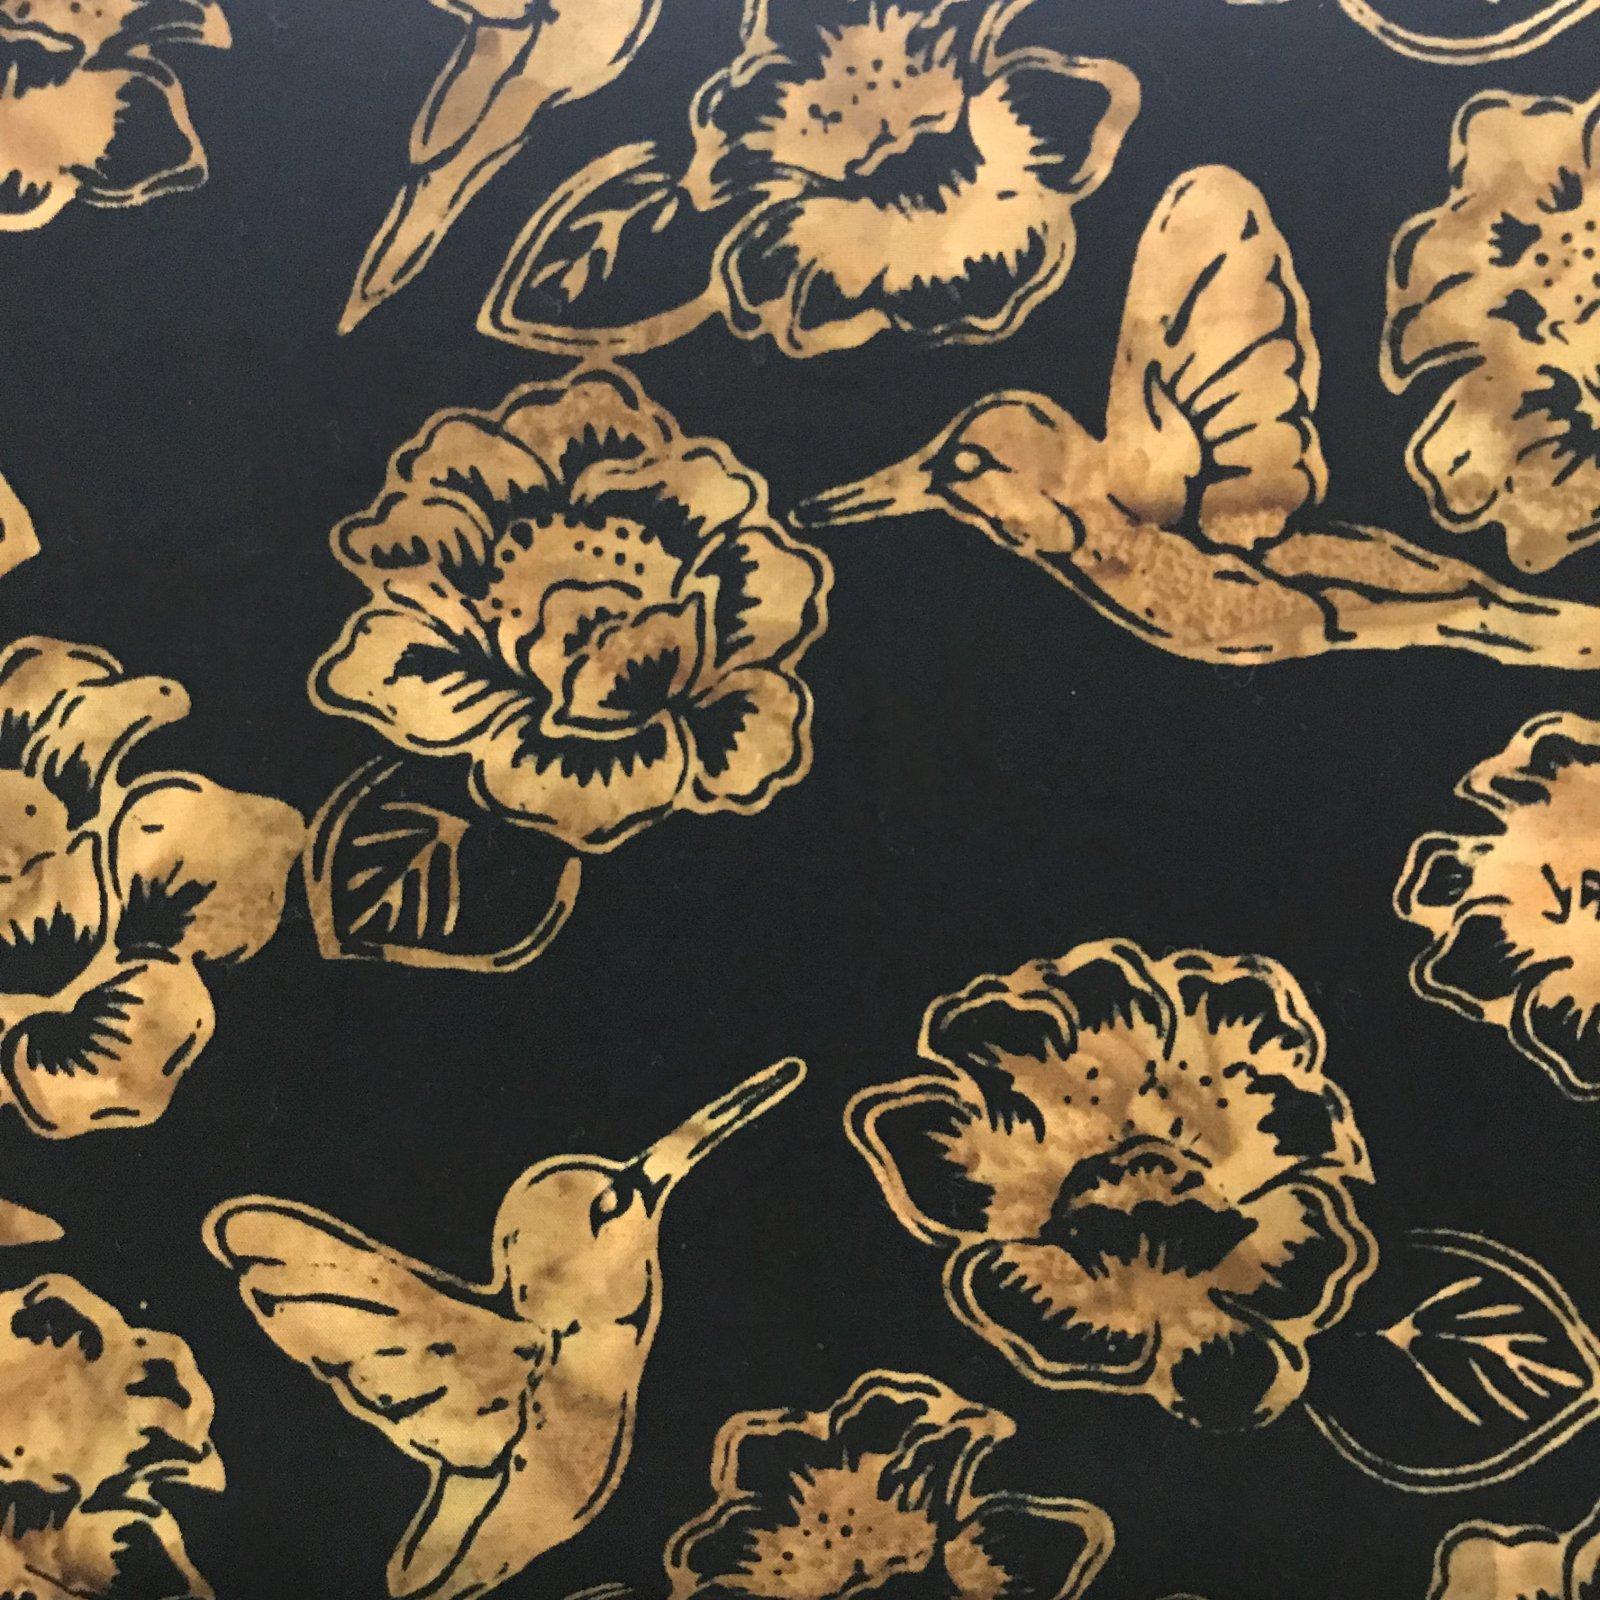 Antique Hummingbird Batik by Hoffman Fabrics J2361A4